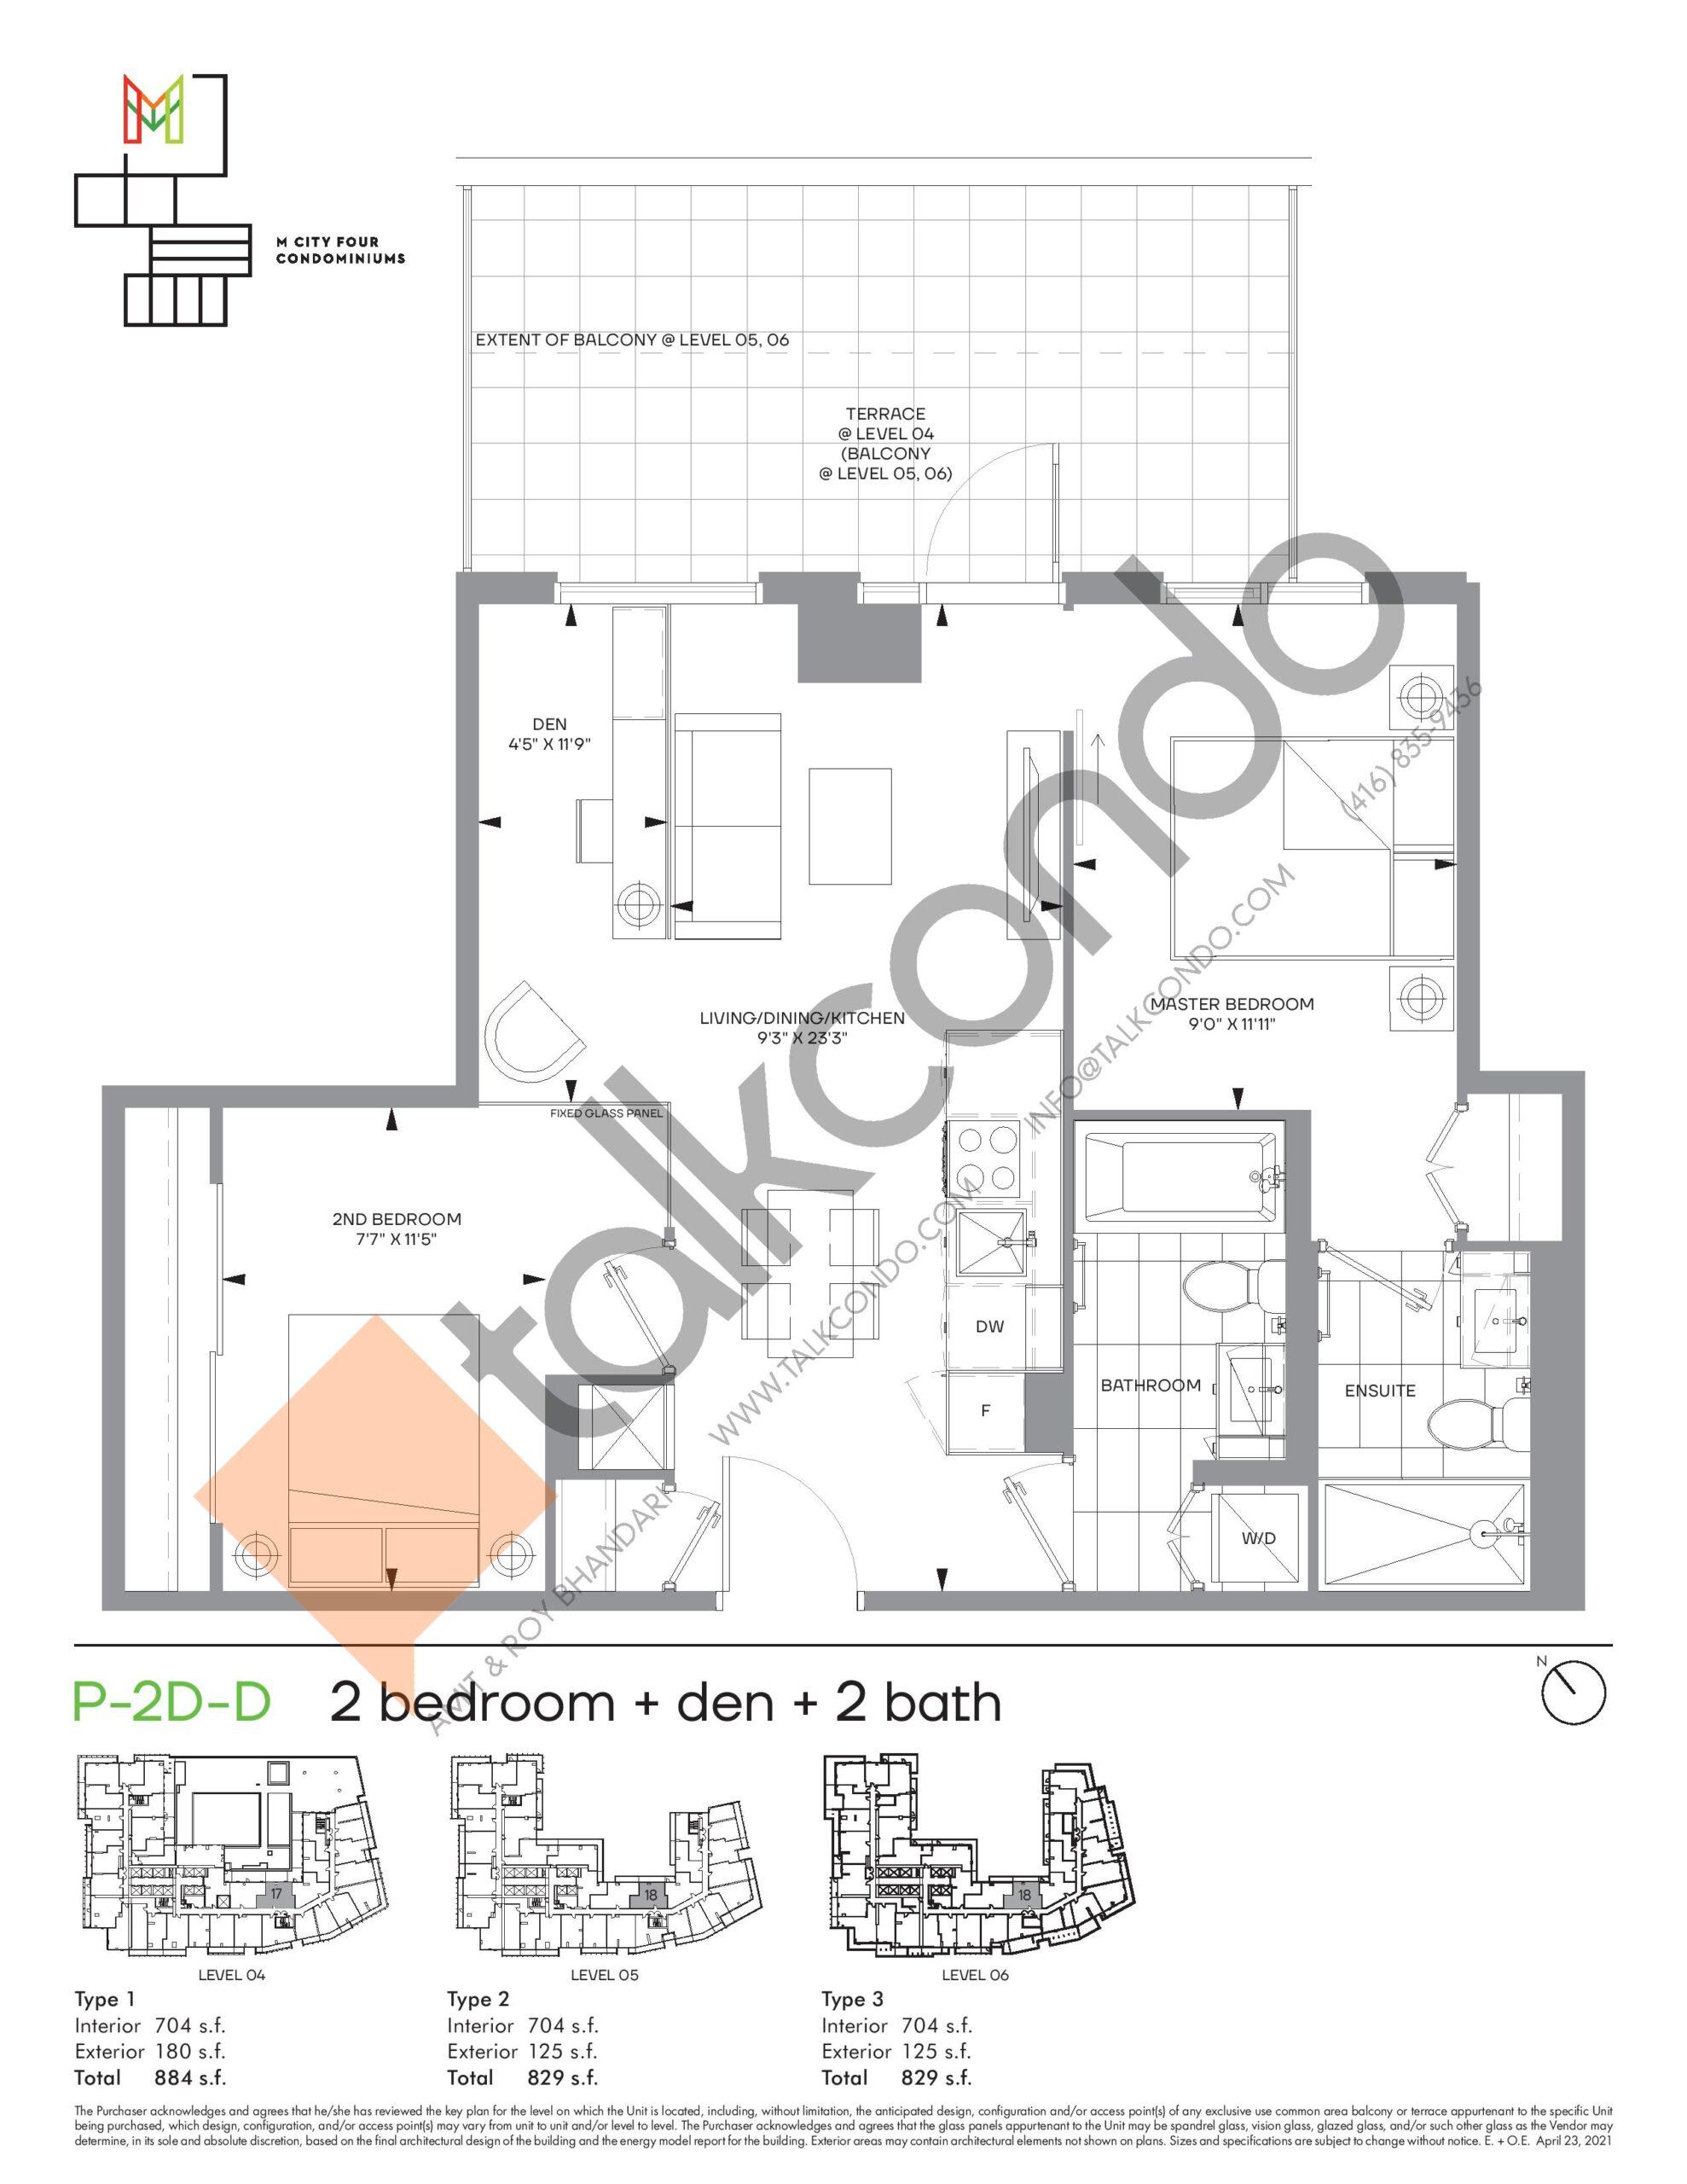 P-2D-D (Podium) Floor Plan at M4 Condos - 704 sq.ft